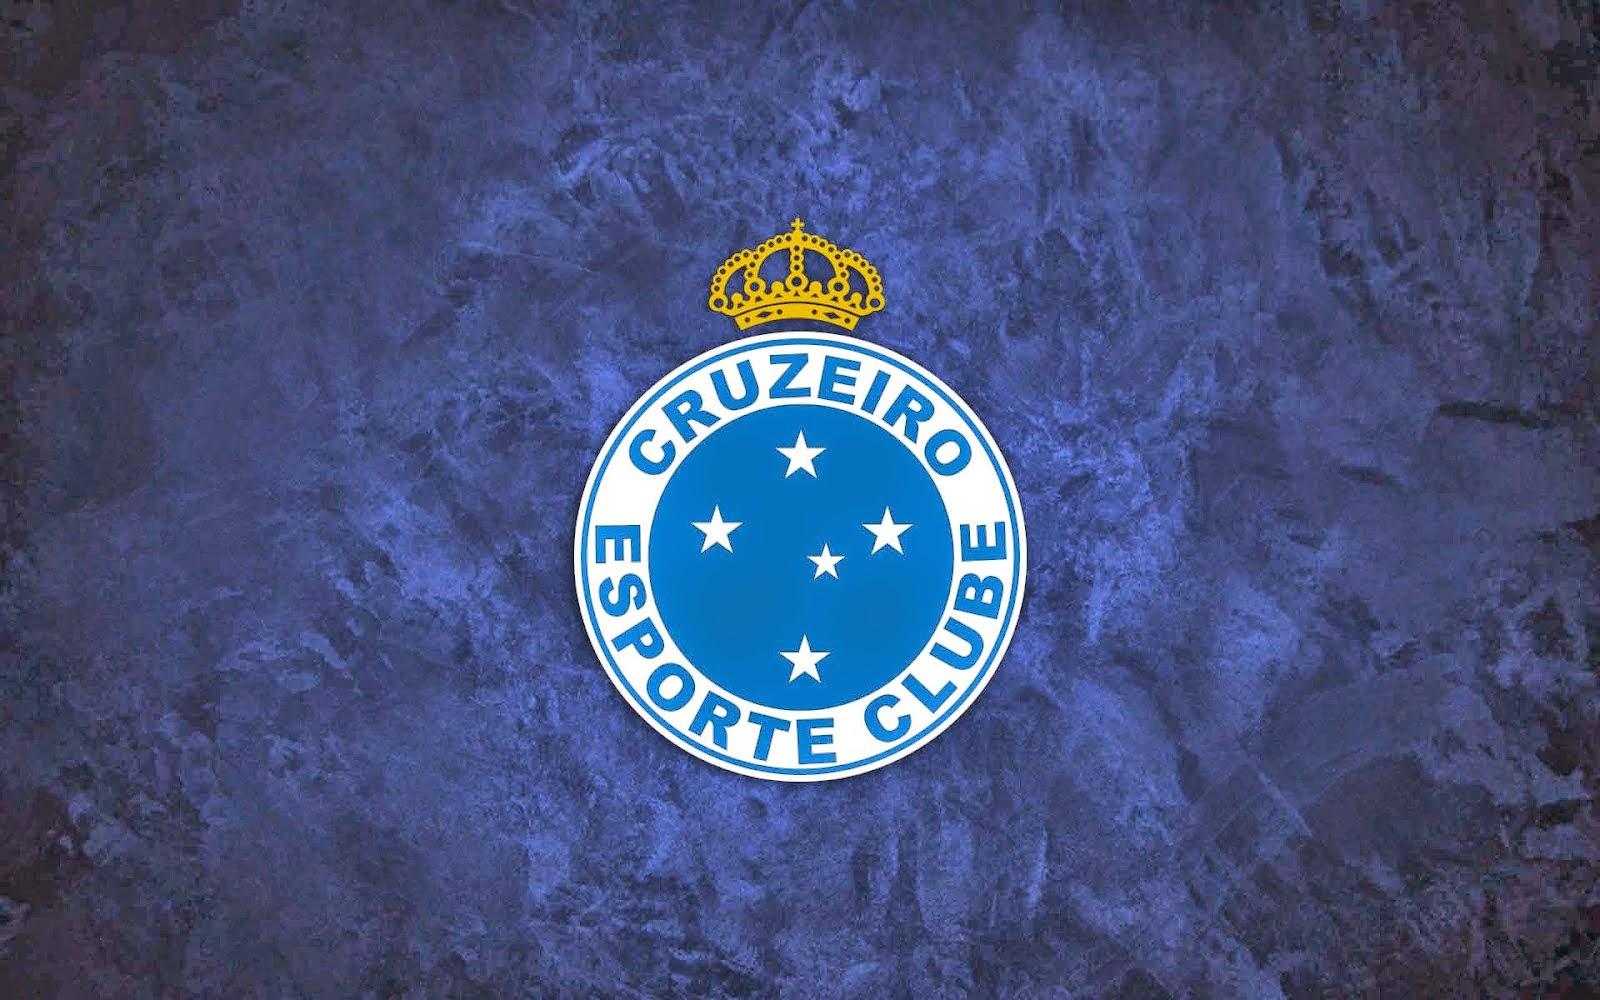 Download Cruzeiro Wallpapers in HD For Desktop or Gadget 1600x1000